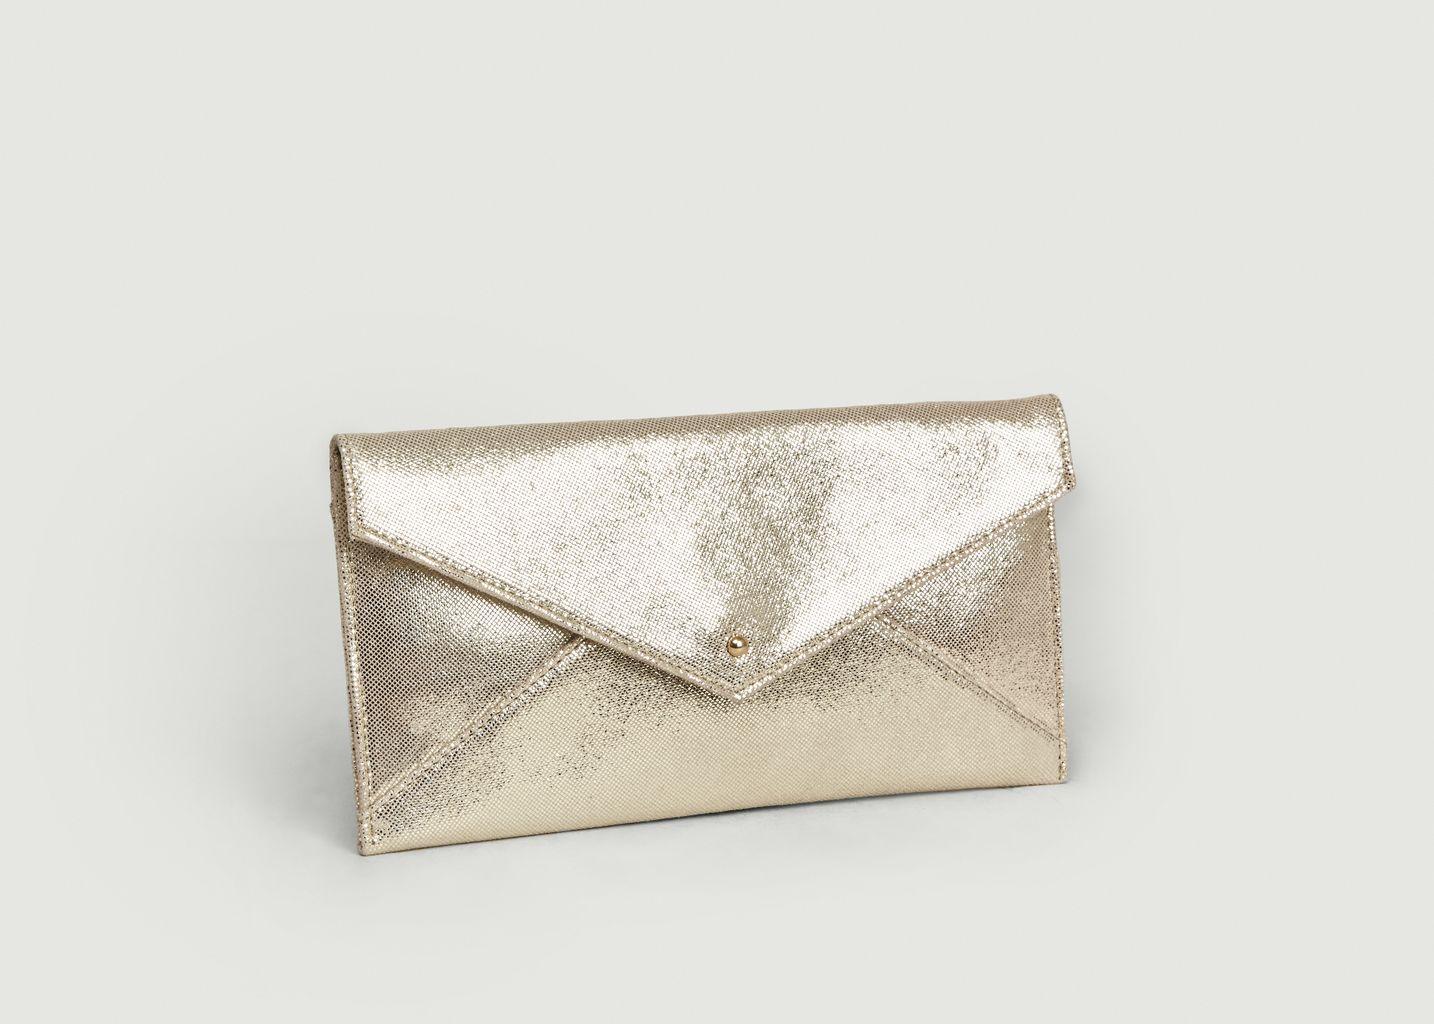 Sac pochette en cuir métallisé Cassandra - Petite Mendigote